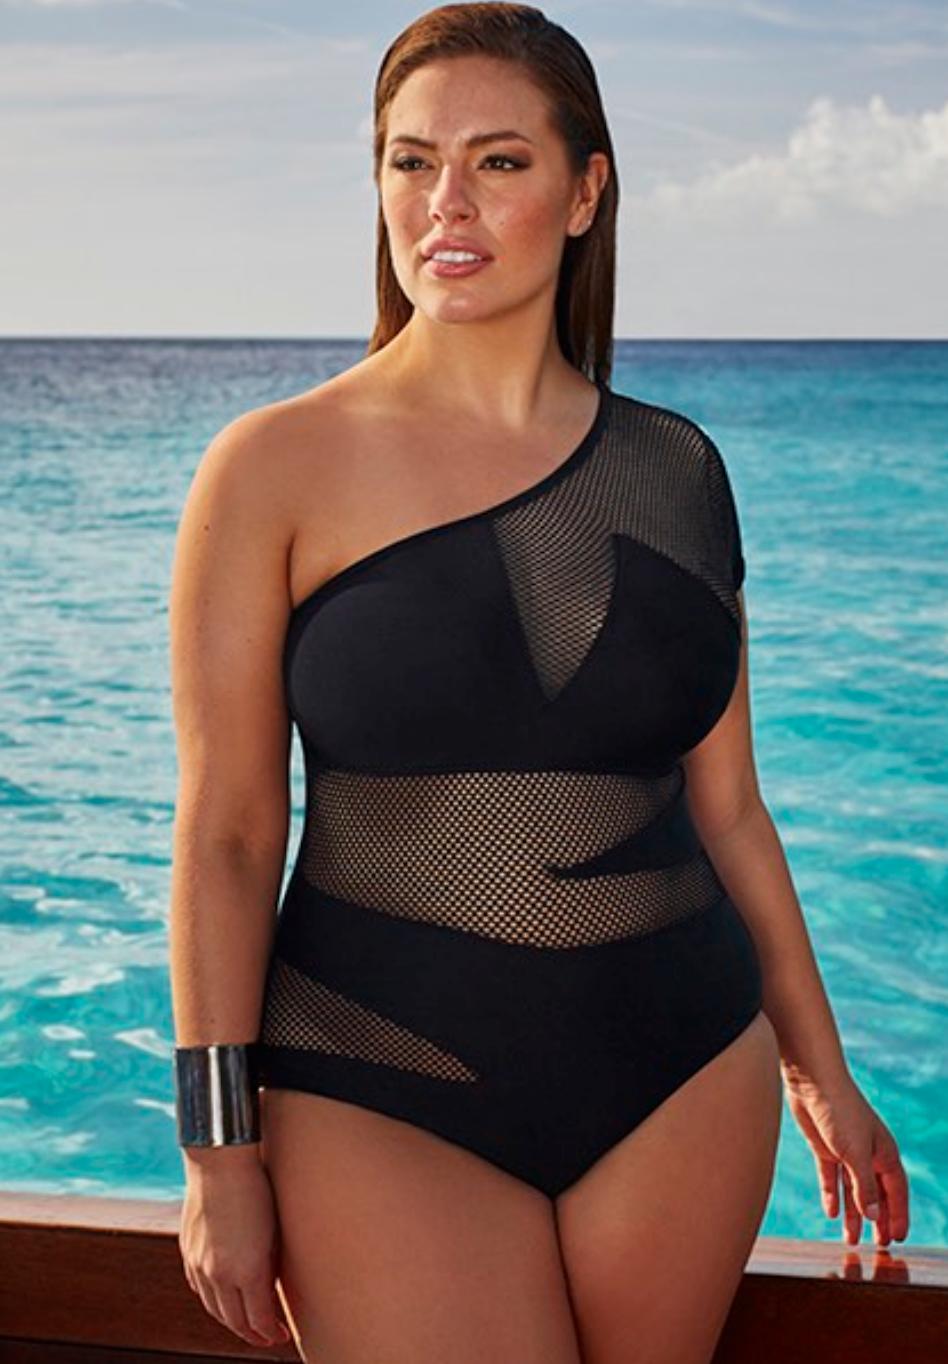 Ashley Graham x swimsuitsforall, Spy Swimsuit 109$